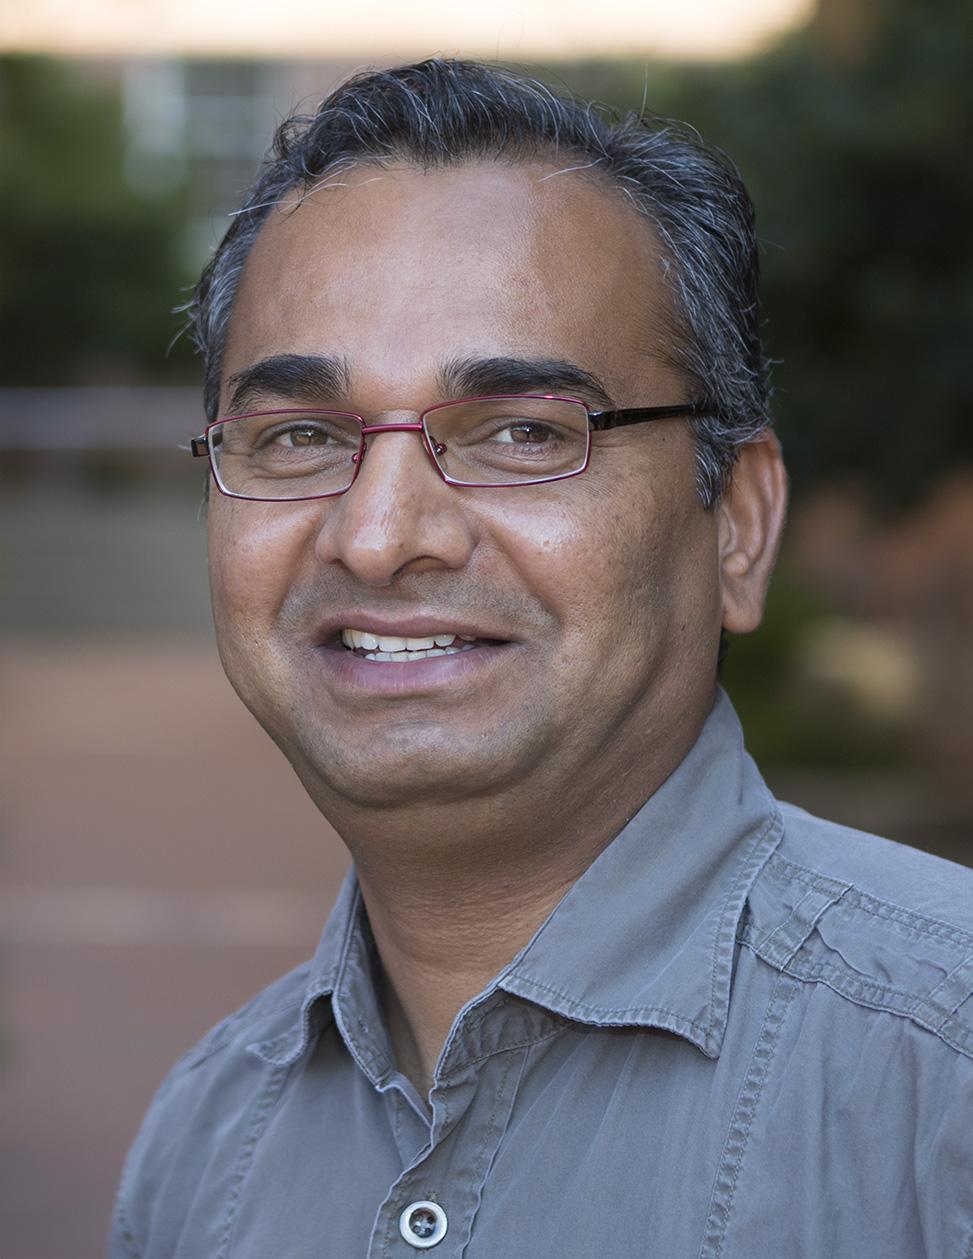 Amar S. Kumbhar